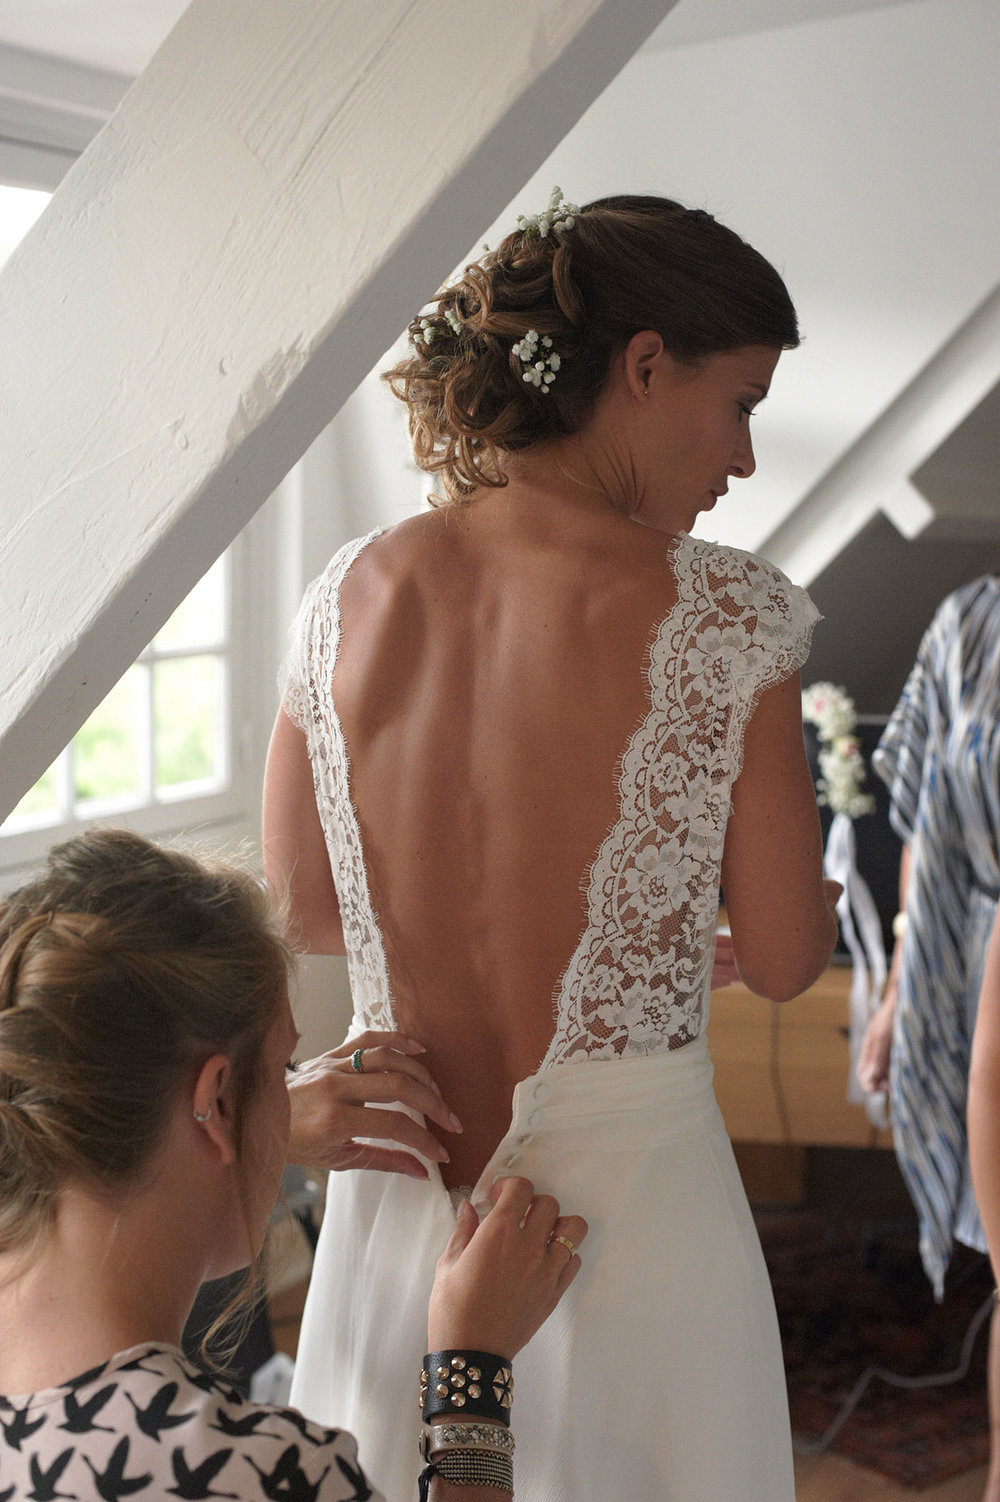 sarah_neale_photographe_mariage_19.jpg